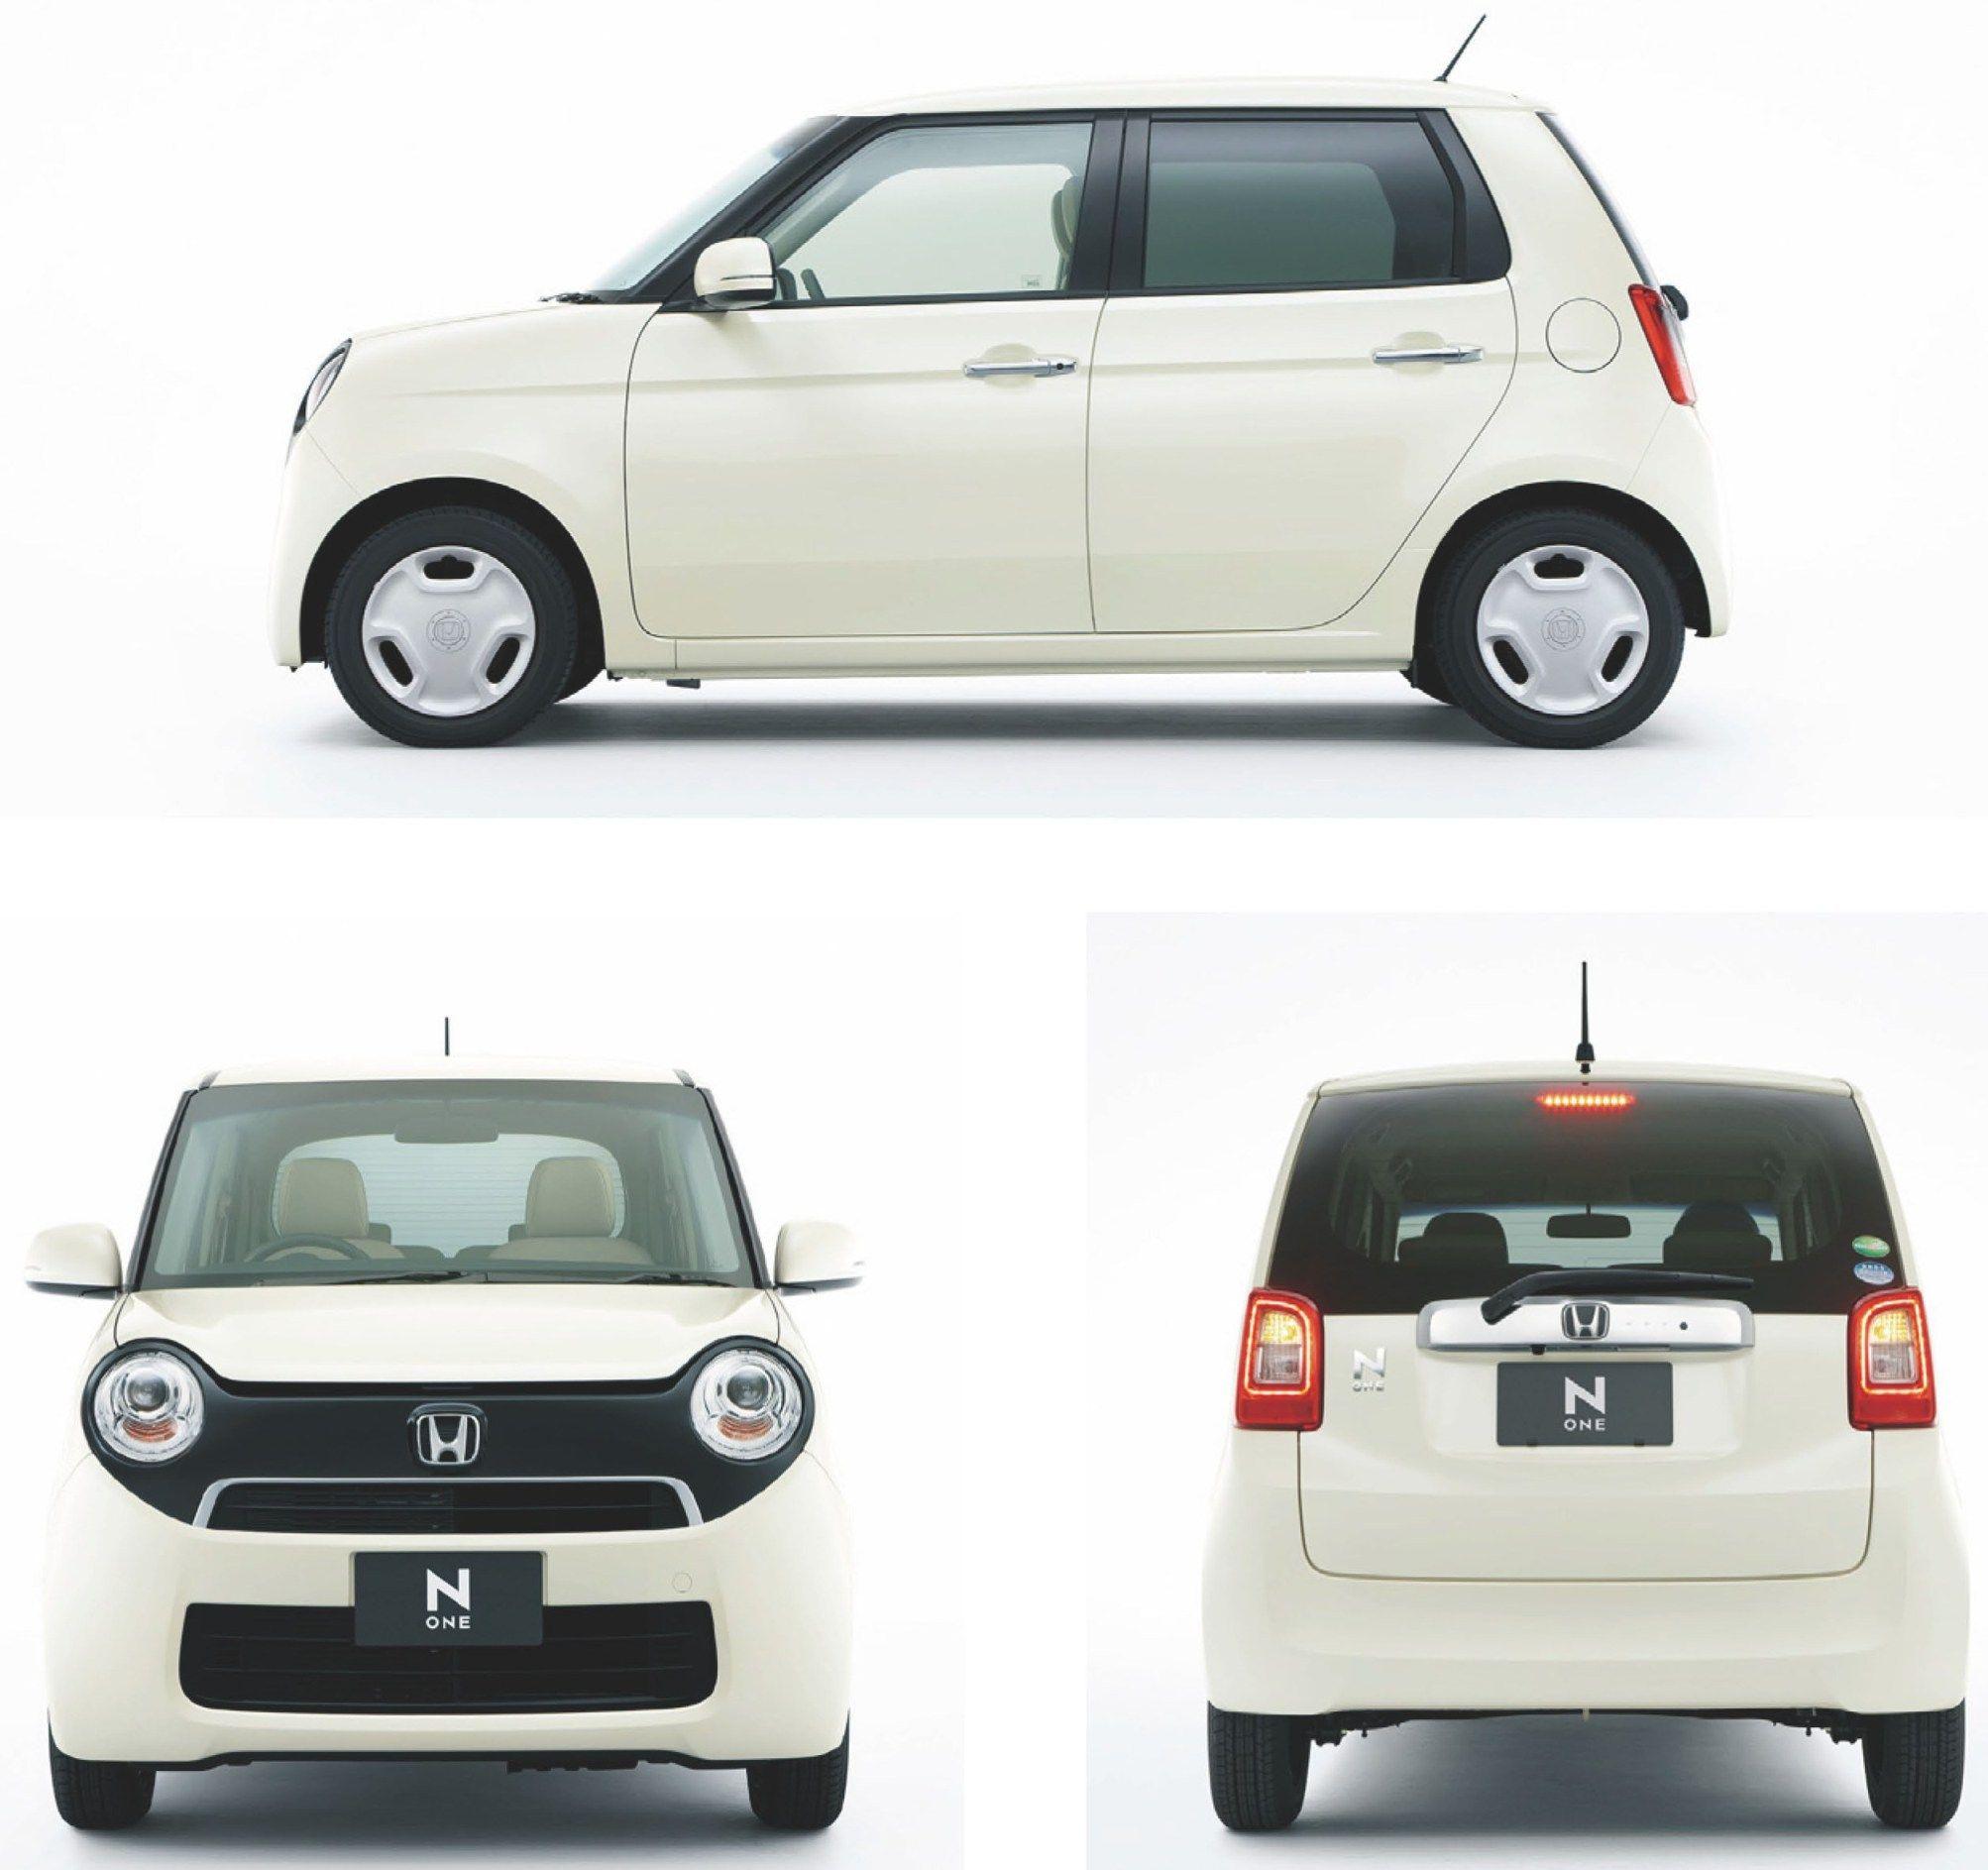 honda-n-one - beautiful updating of my very first car, the Honda 360 ...